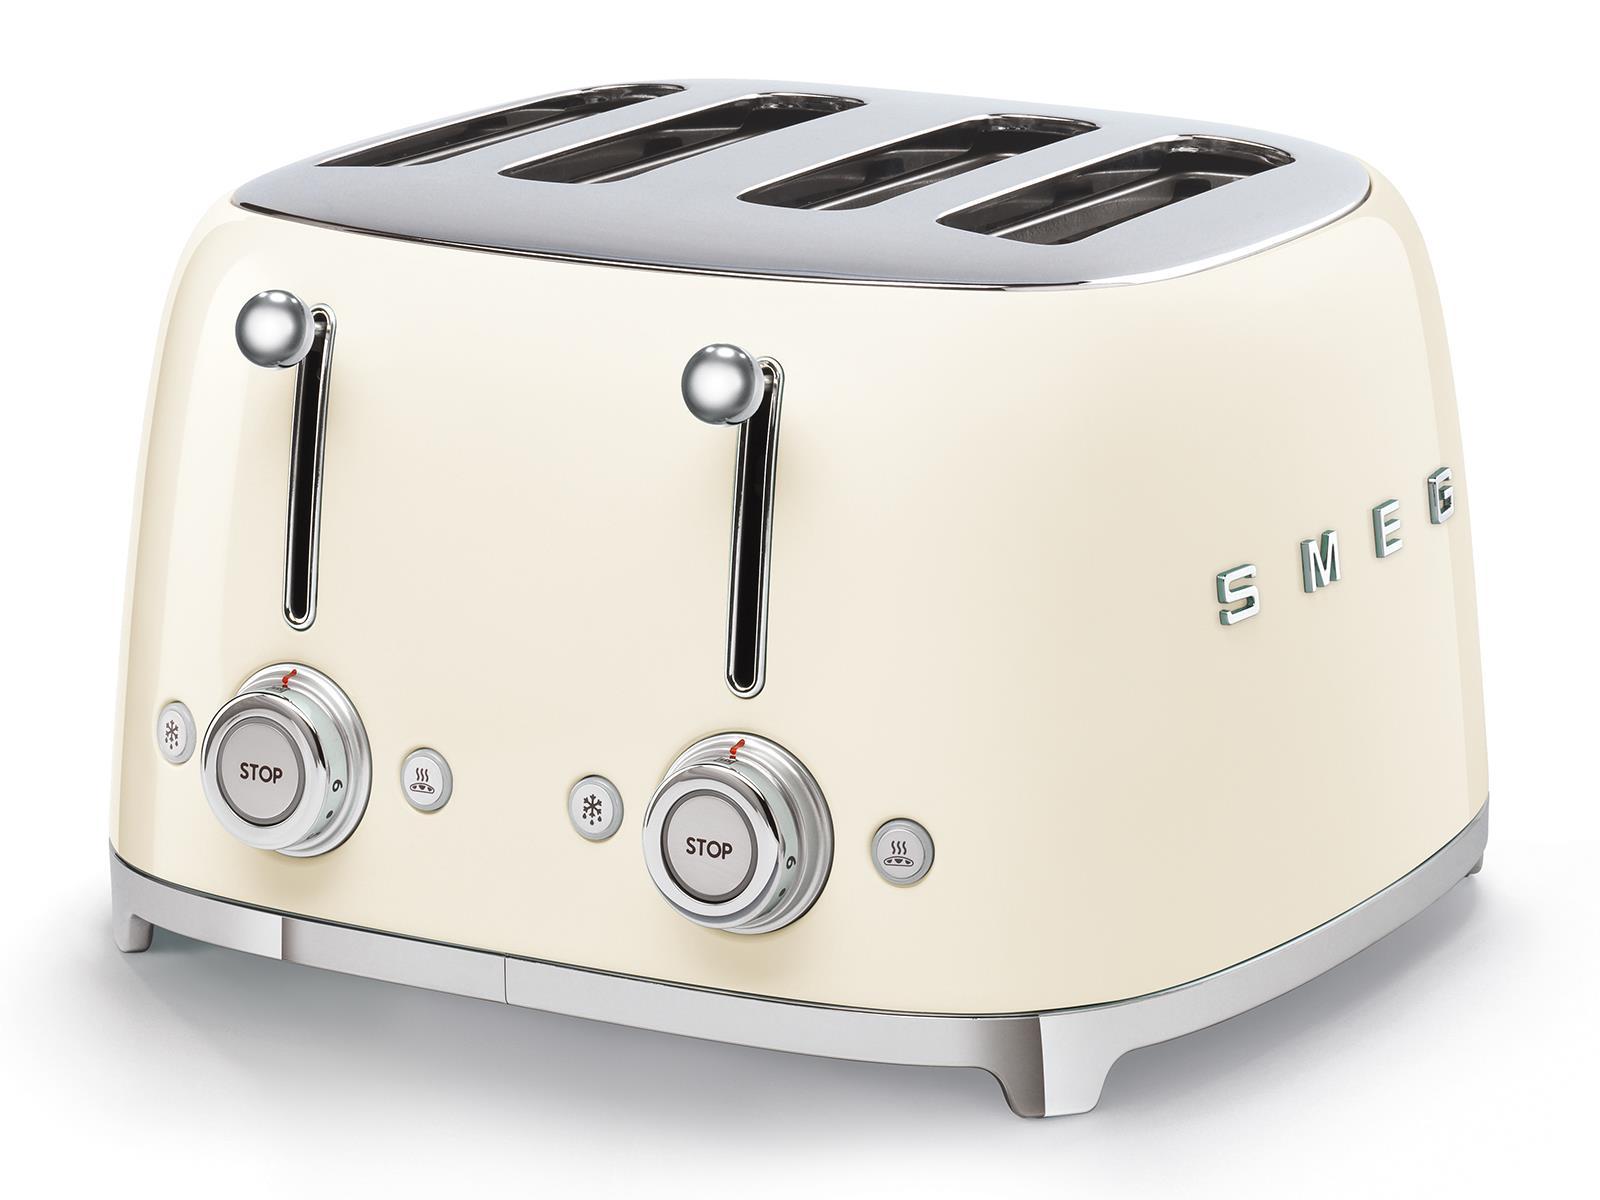 Smeg Retro Toaster Square 4 Slice Vintage Cream